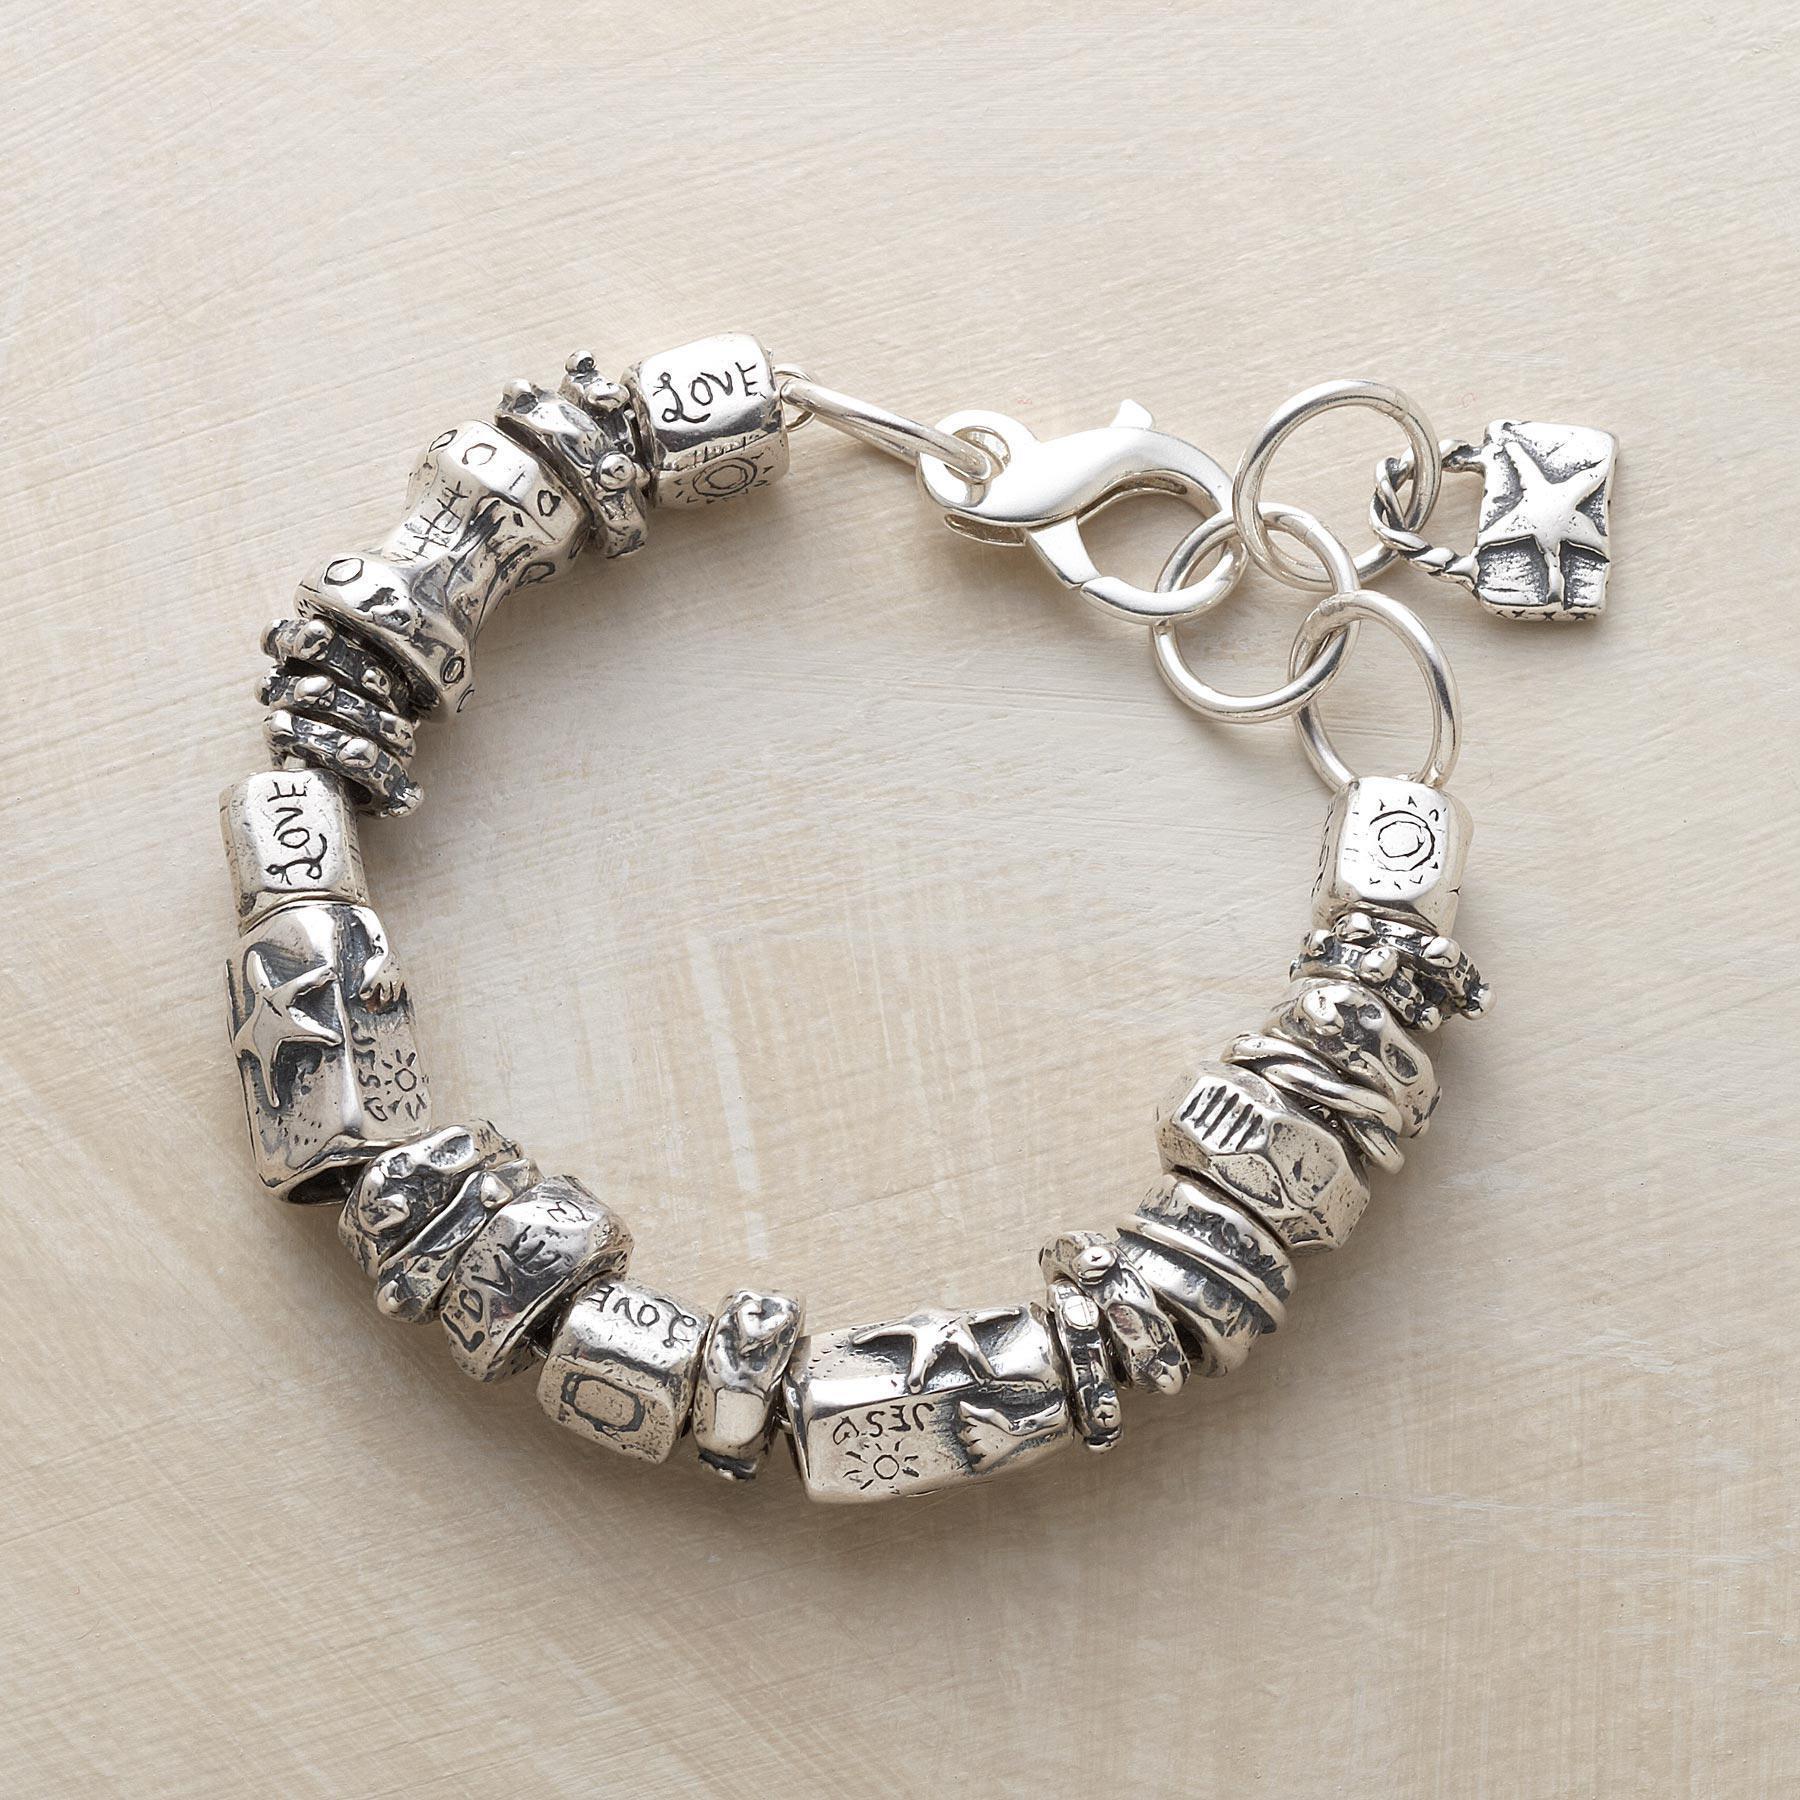 All Silver Charmed Life Bracelet